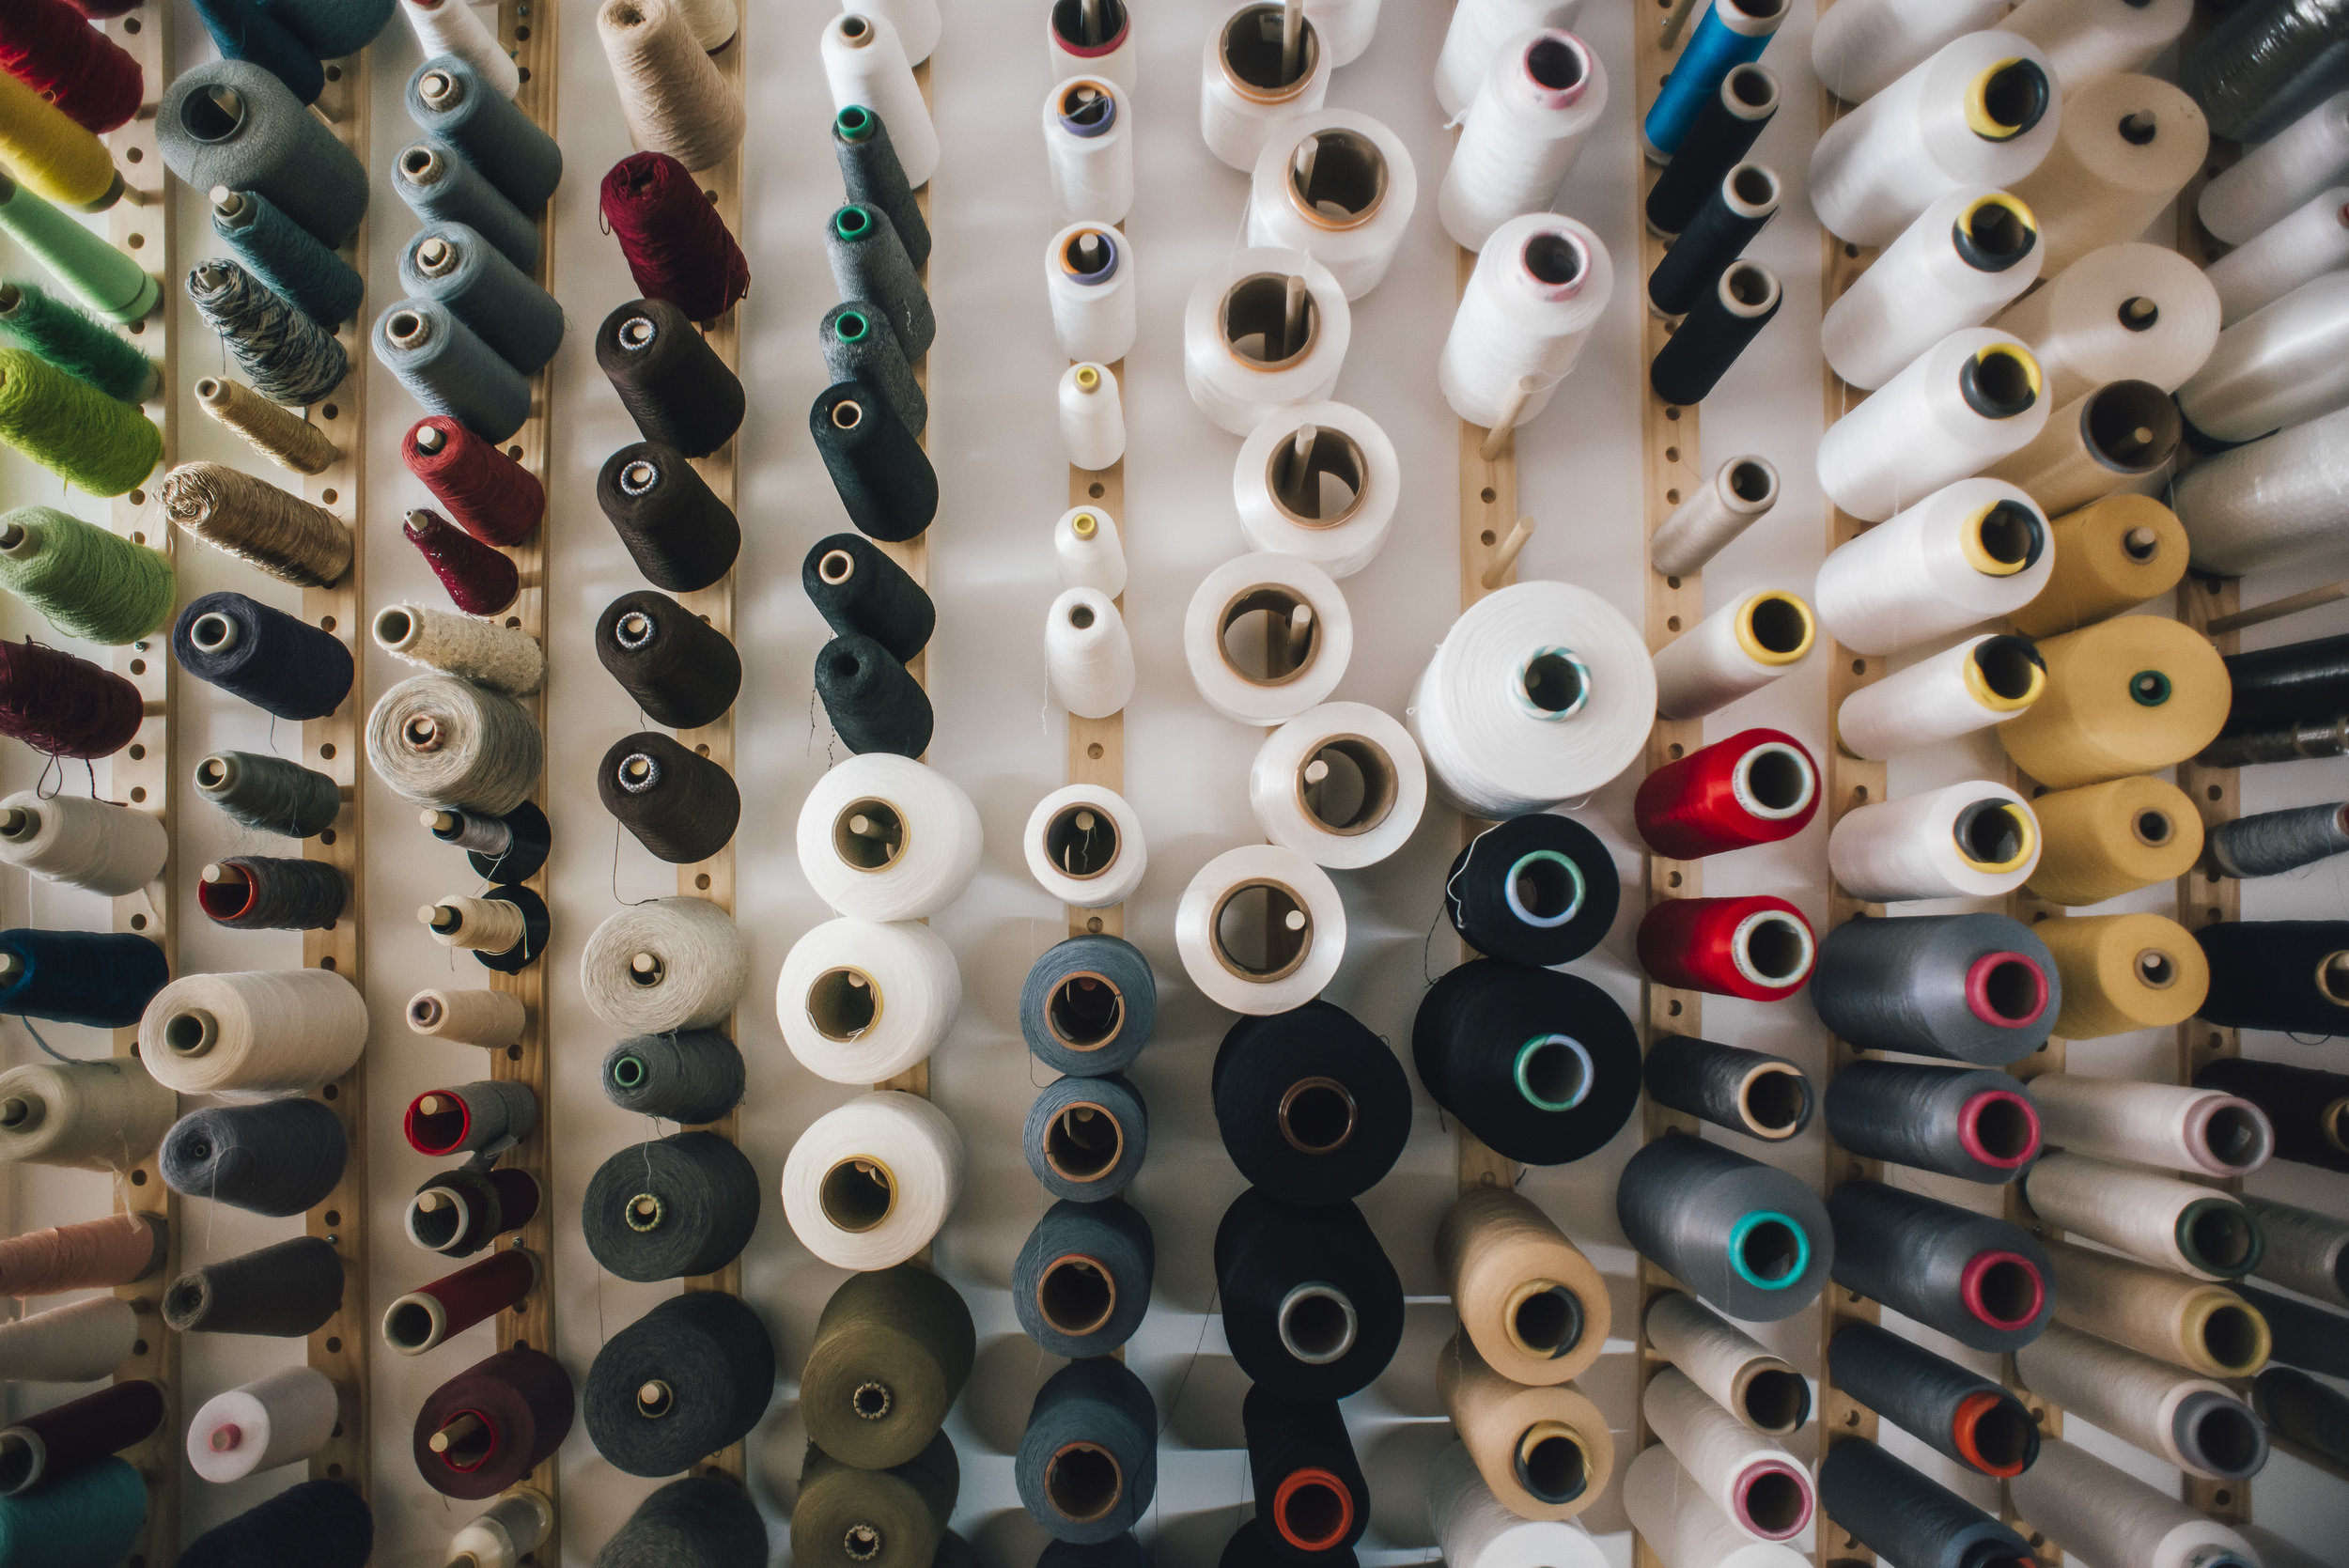 KnitIt_LizHilton_MatthewProvoastPhotography-6.jpg